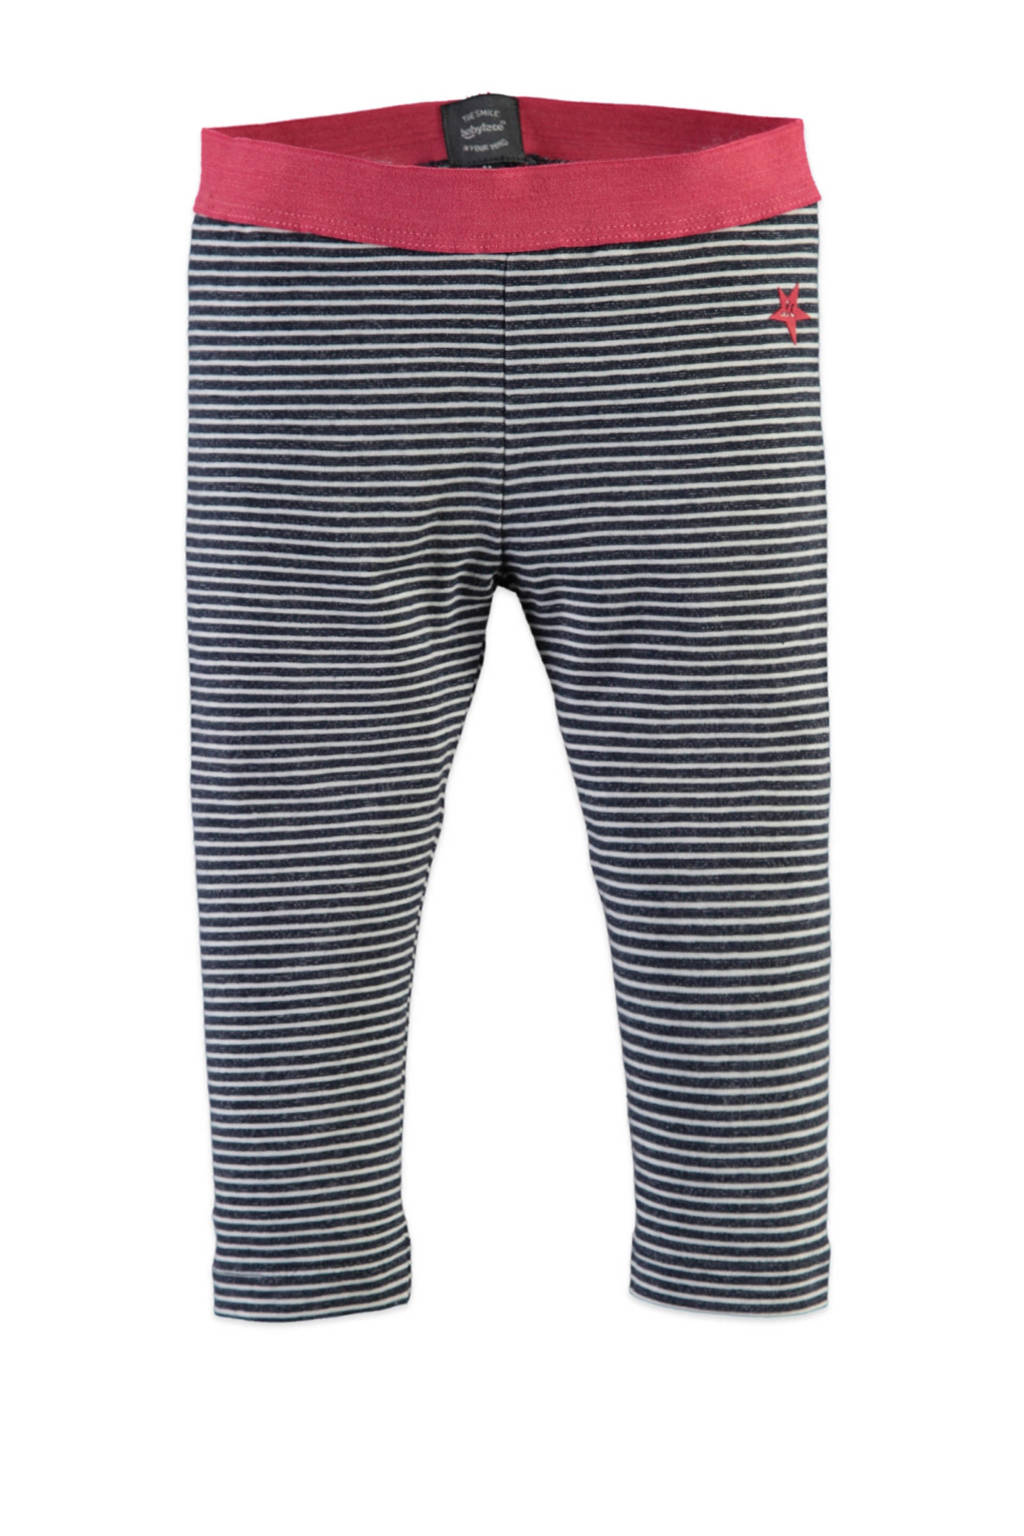 Babyface gestreepte regular fit legging donkerblauw/wit, Donkerblauw/wit